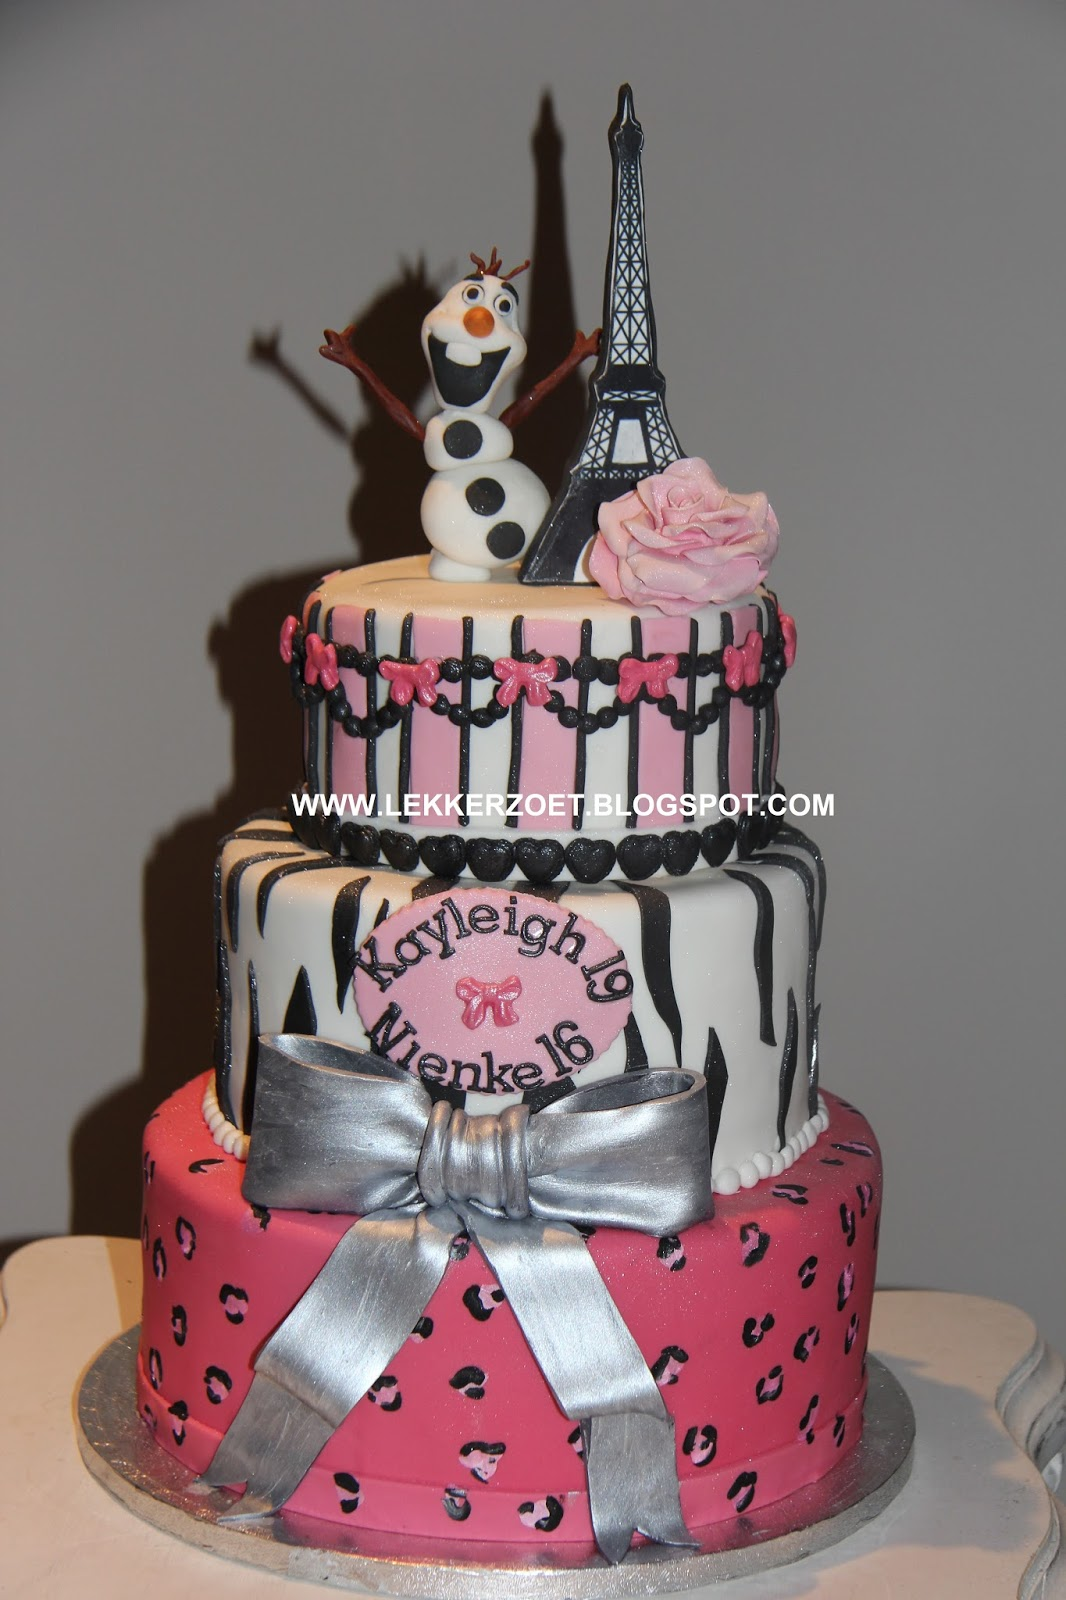 Populair lekker zoet: De eigen ontwerp taart van Kayleigh 19 jaar en Nienke  @QF-01